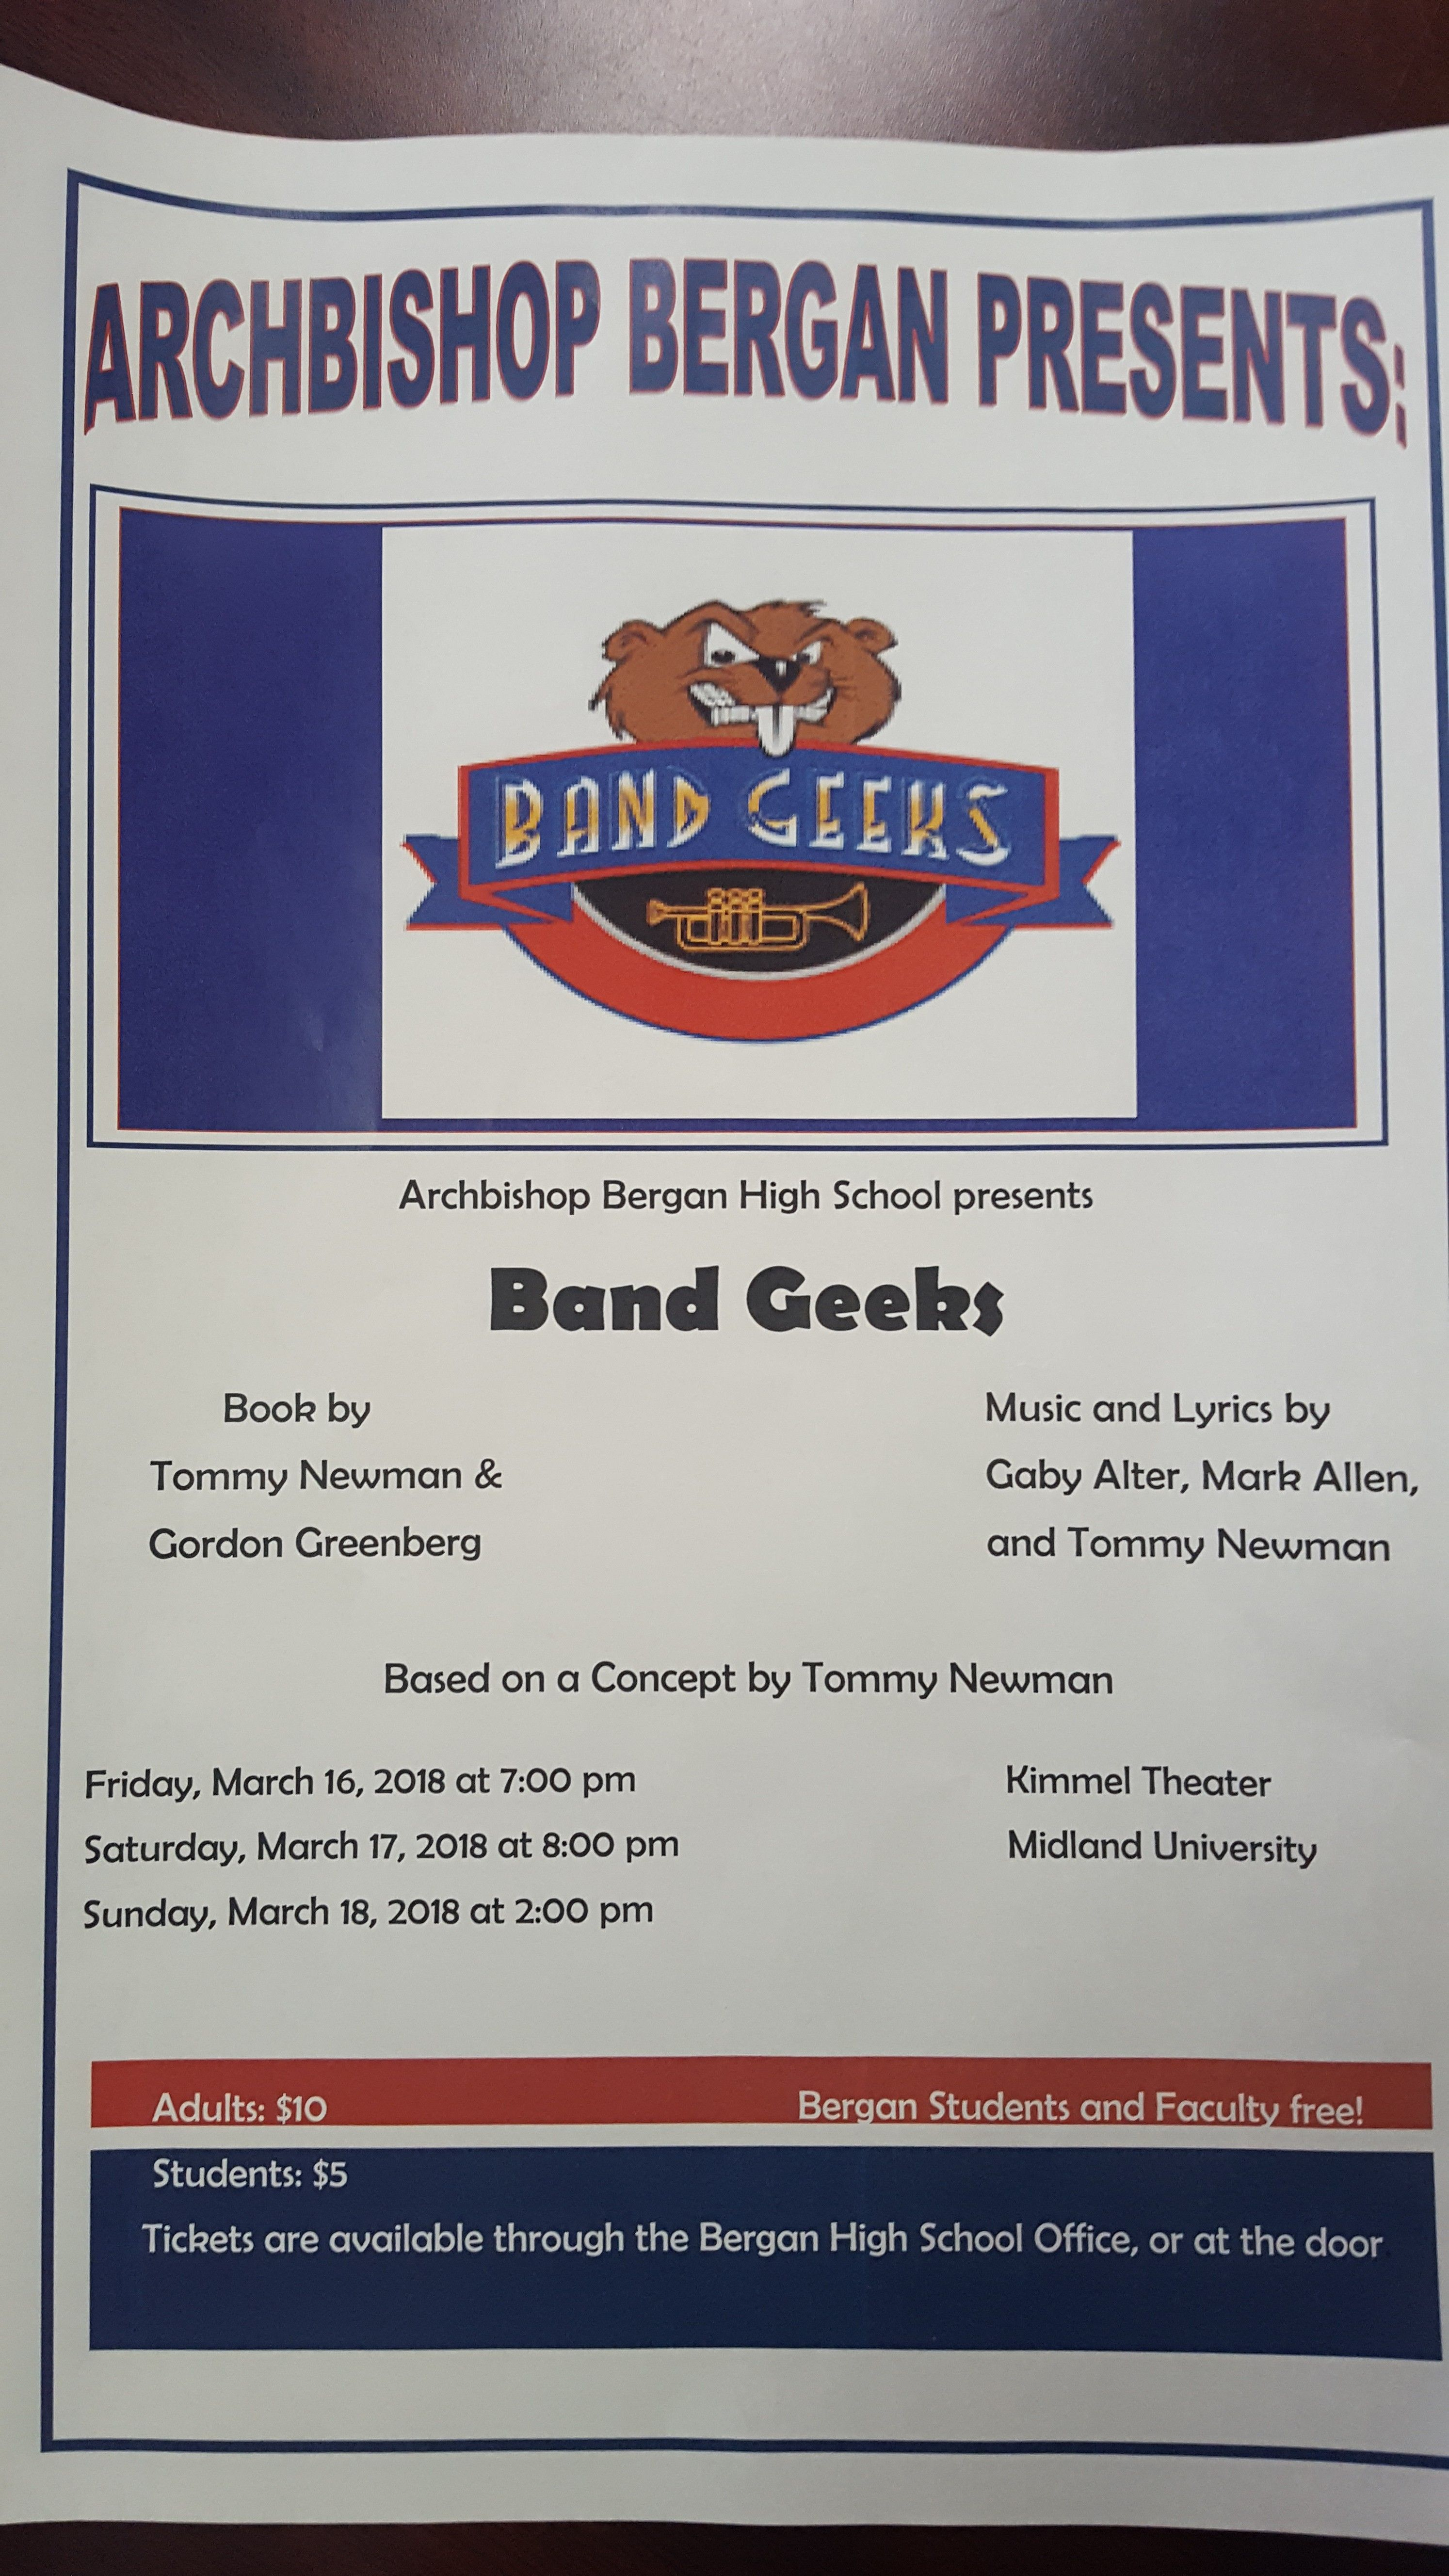 Bergan Presents the Musical, Band Geeks